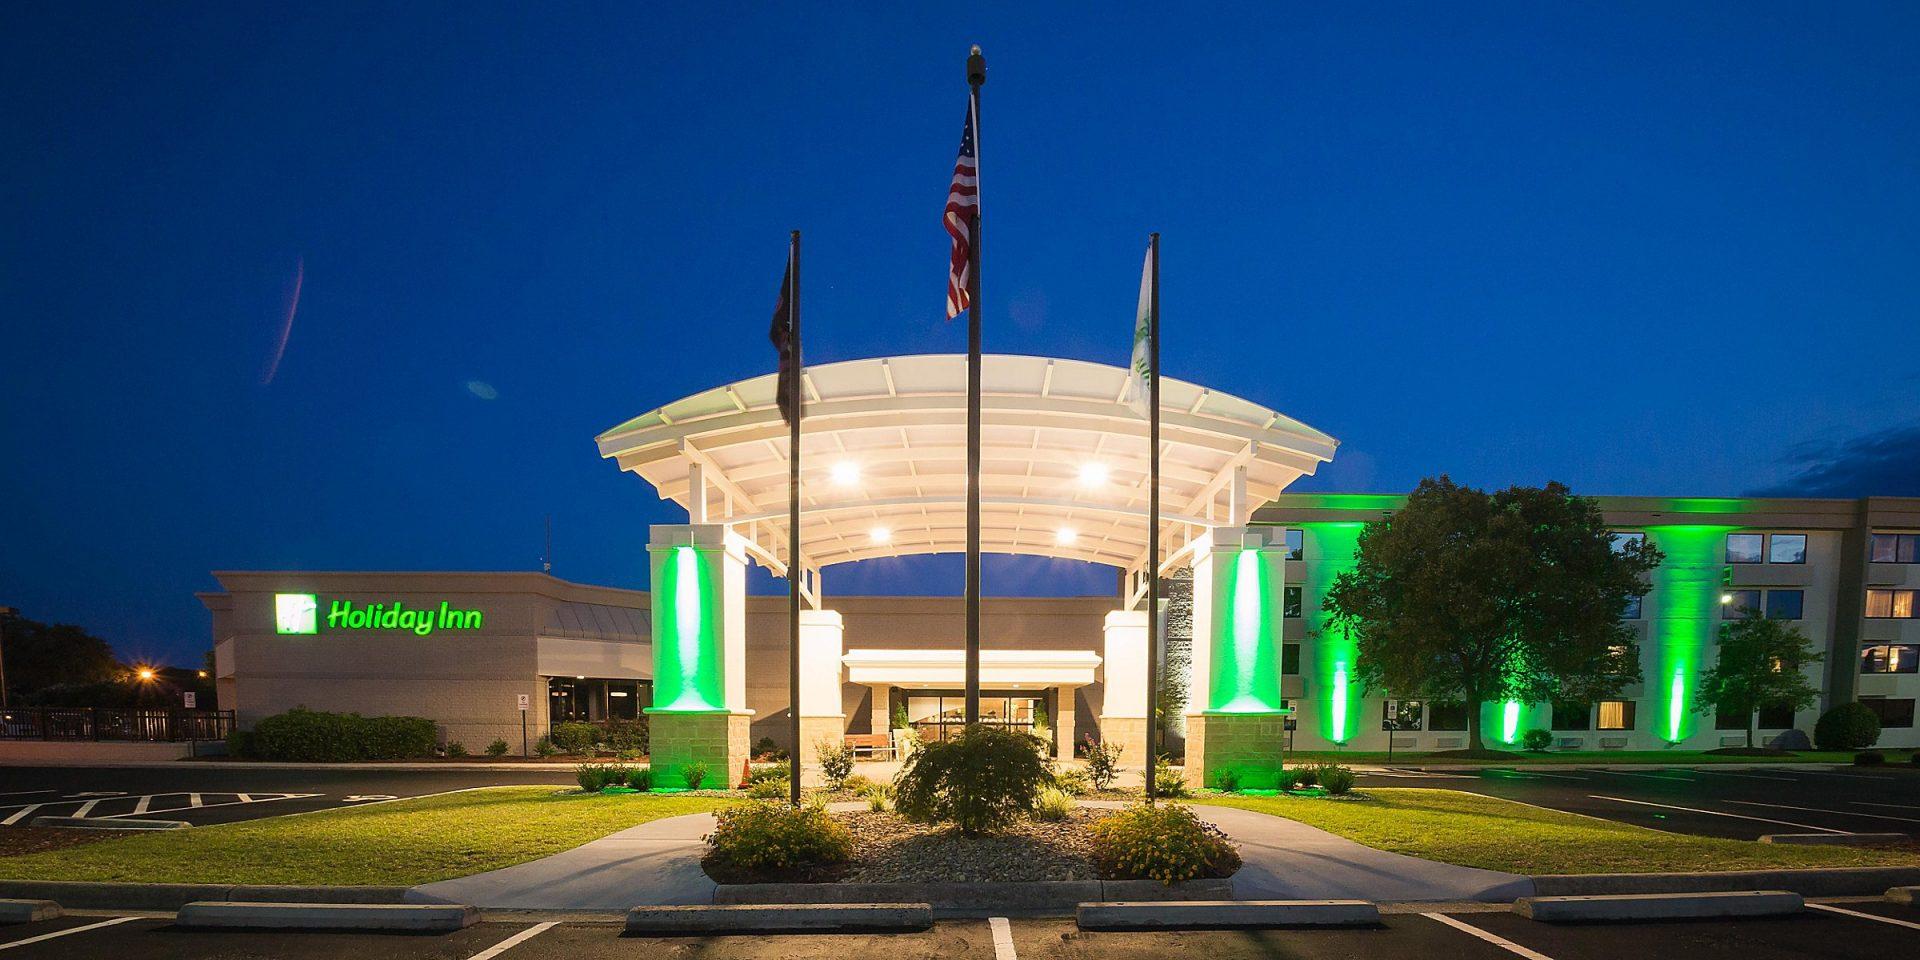 Holiday Inn - Greenville, NC